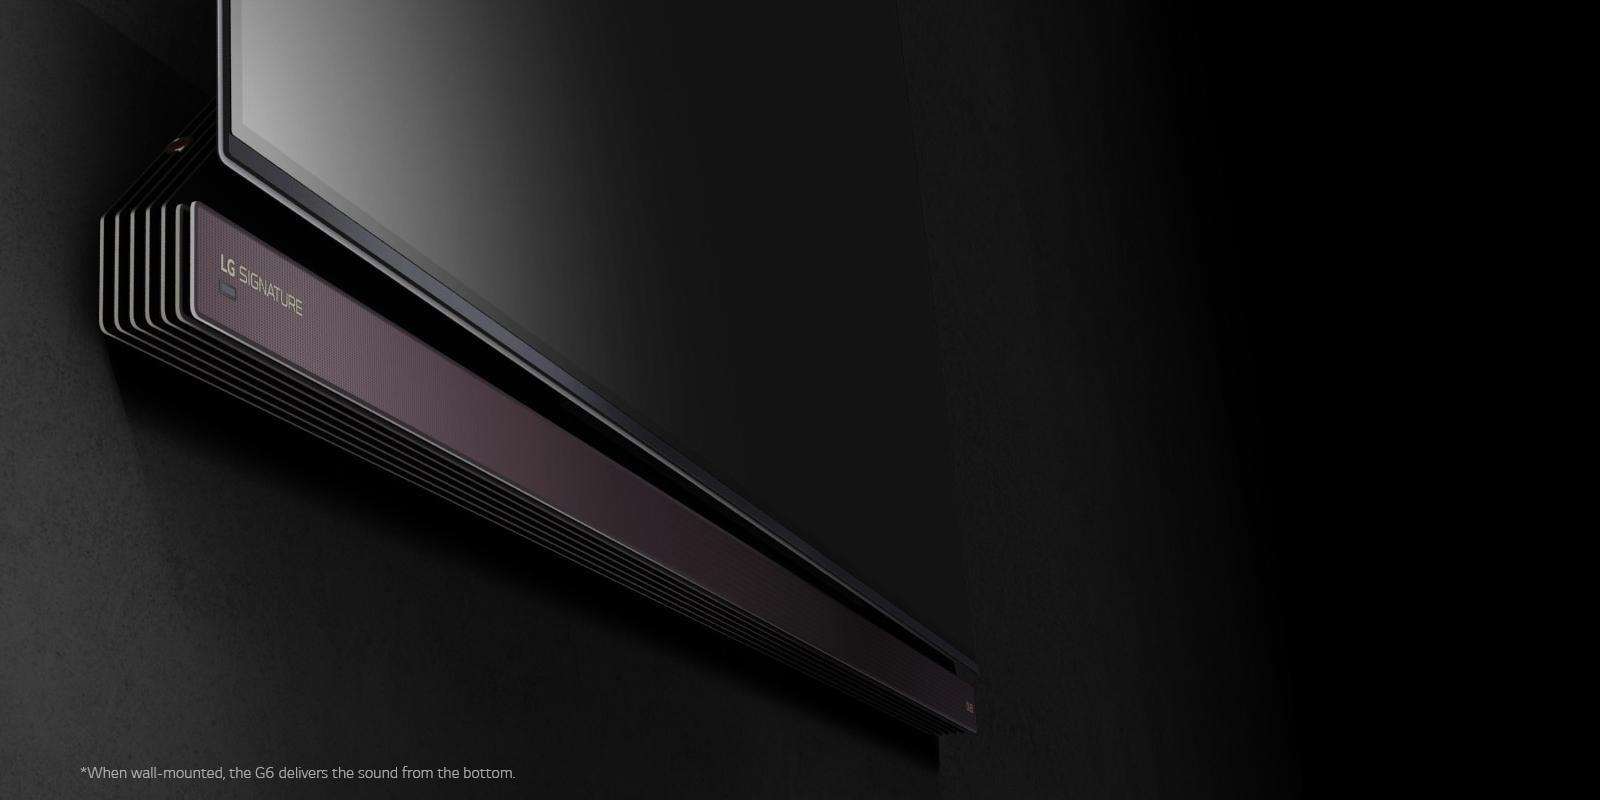 Lg Oled65g6p Lg Signature G6 65 Inch Oled 4k Smart Tv